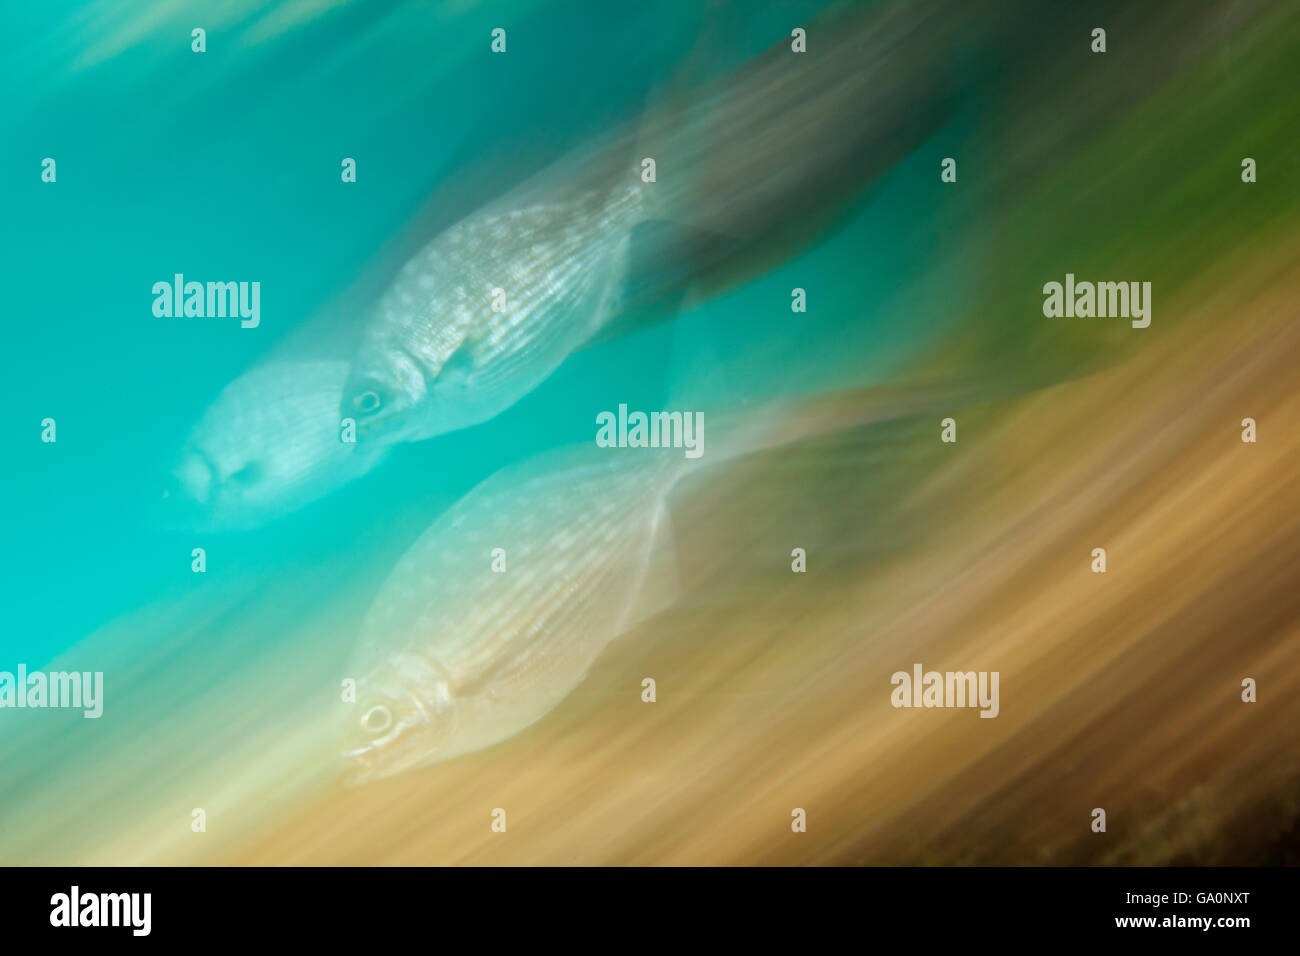 Gelbe Döbel (Kyphosus Schneidezahn) verschwommen Bewegung, Yalku Einlass, Karibik, Mexiko, Februar Stockbild